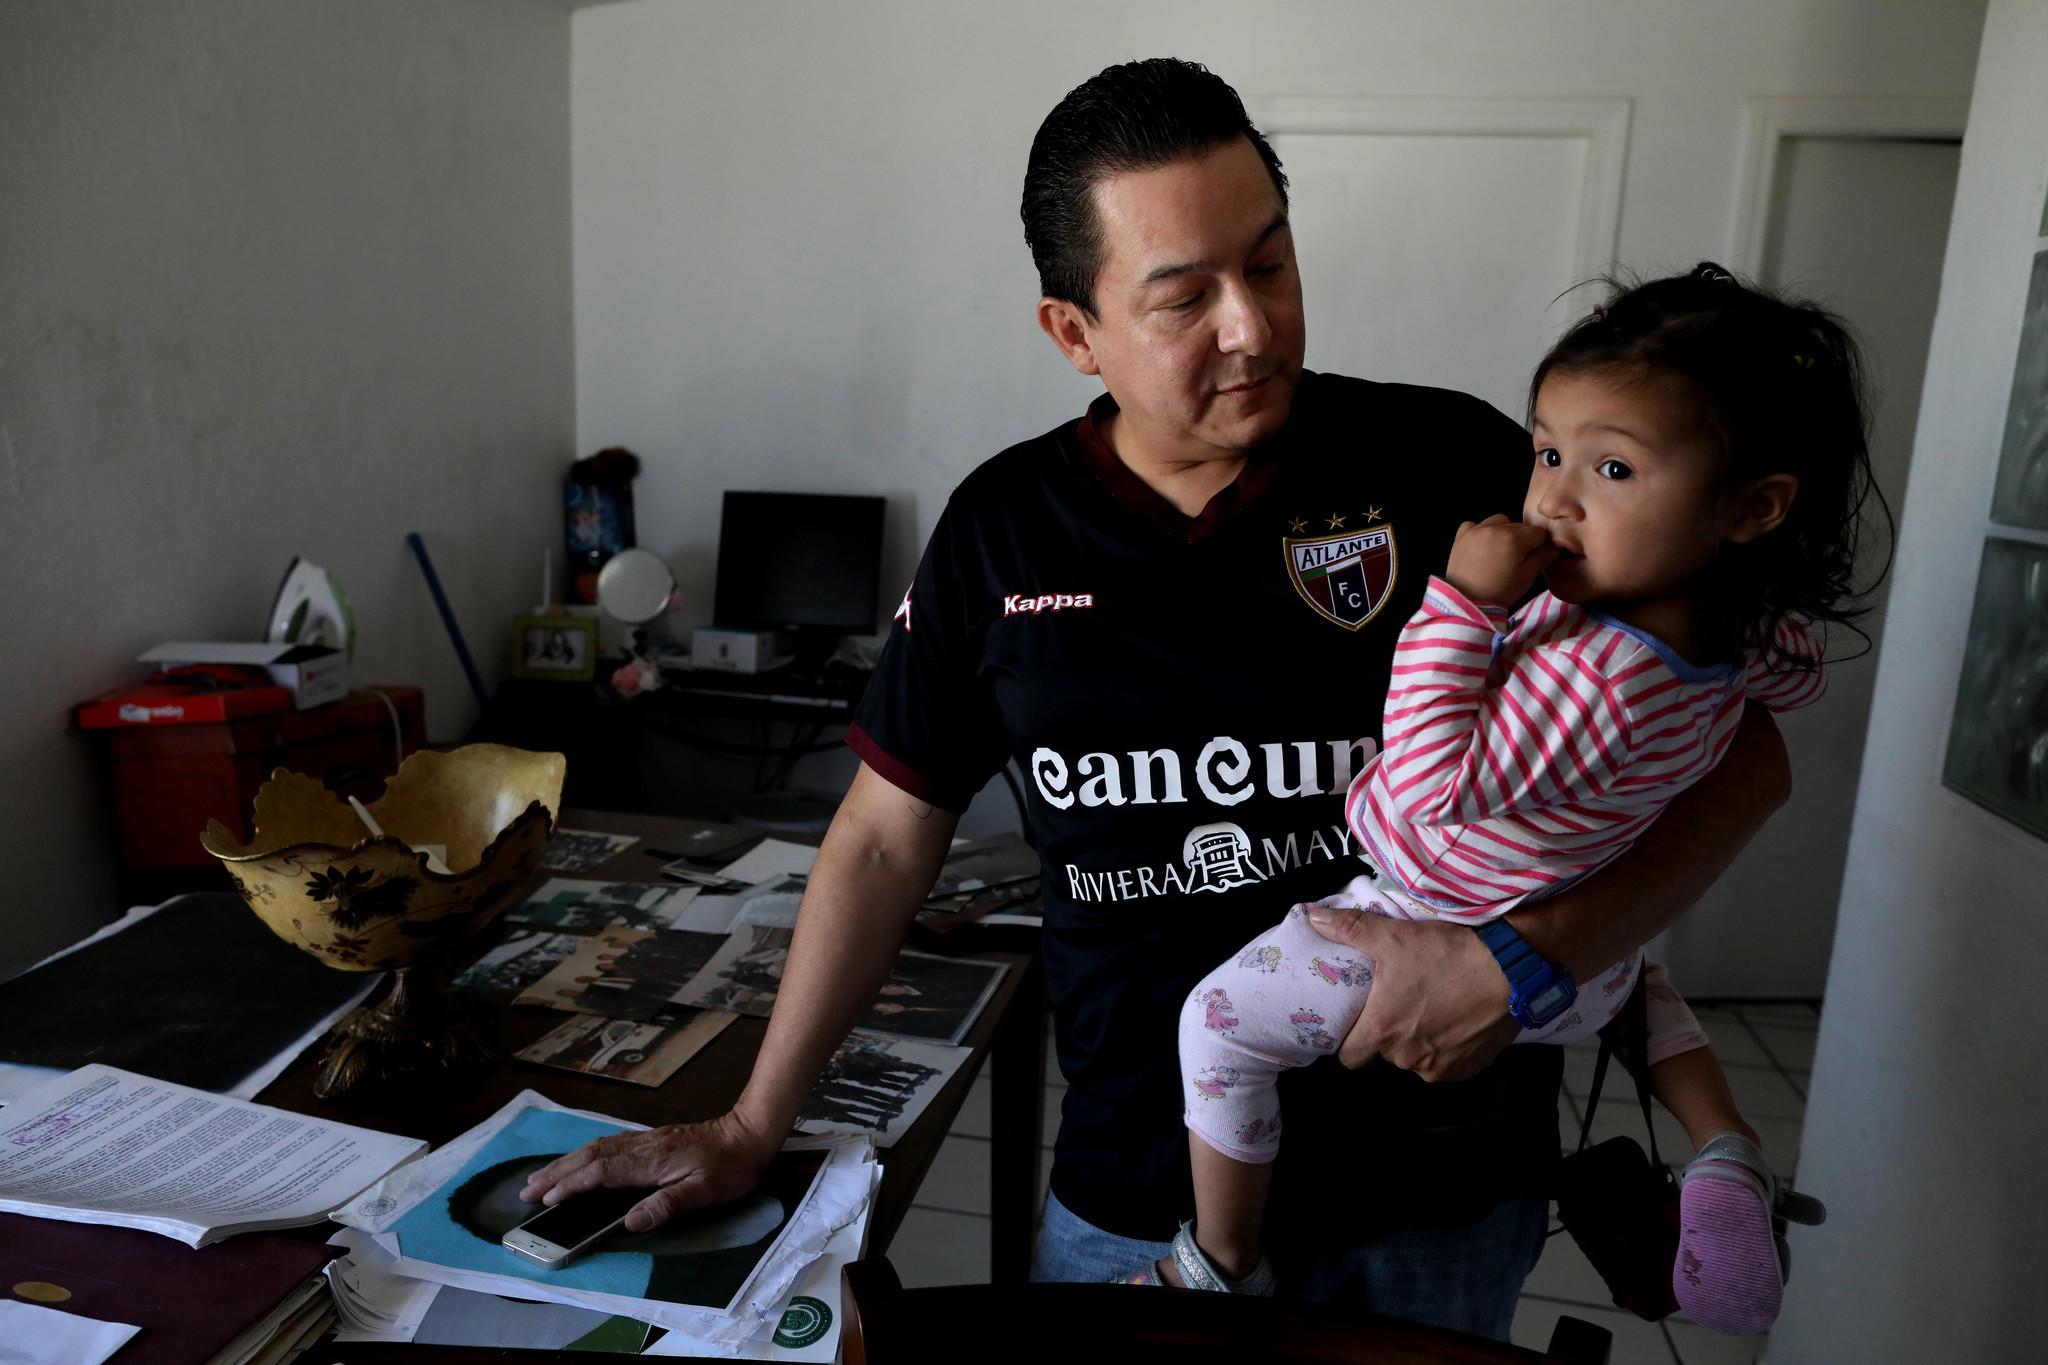 TIJUANA, BAJA CALIF. -- FRIDAY, MAY 17, 2019: Jose Luis Hernandez Galvez, 46, municipal police offic